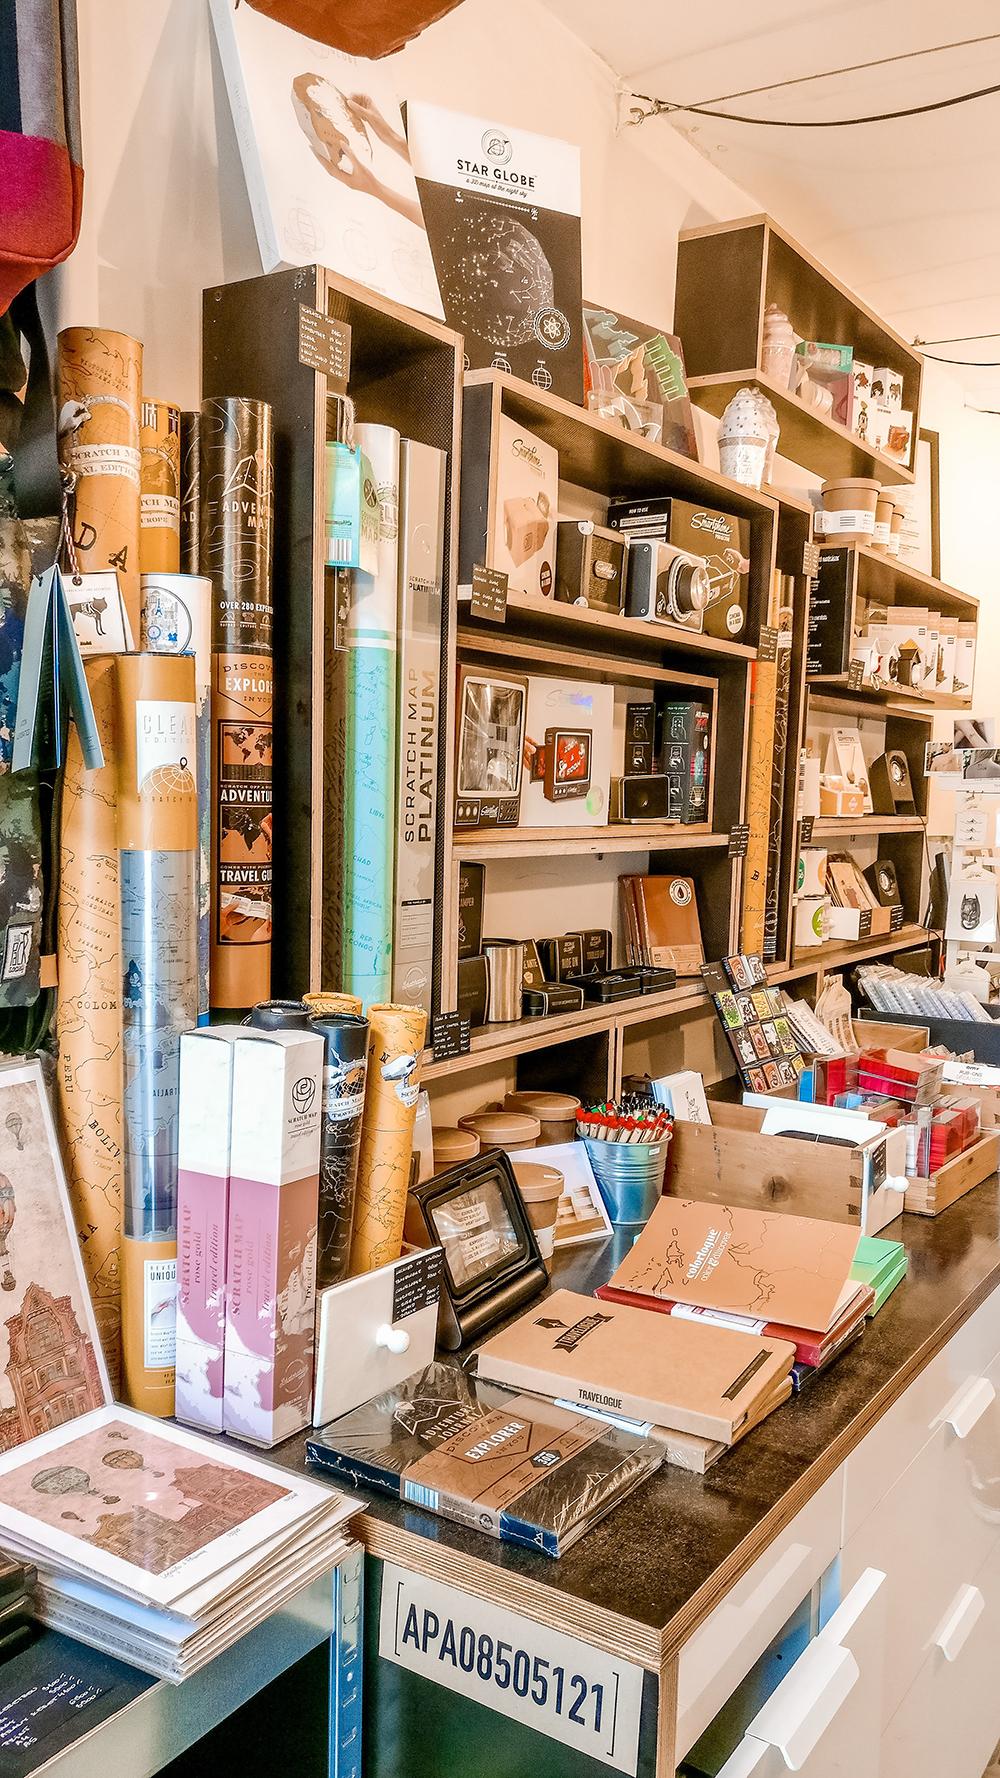 Fekete Design Spot / Insitu - Budapest design shop guide to best Hungarian souvenirs | Aliz's Wonderland